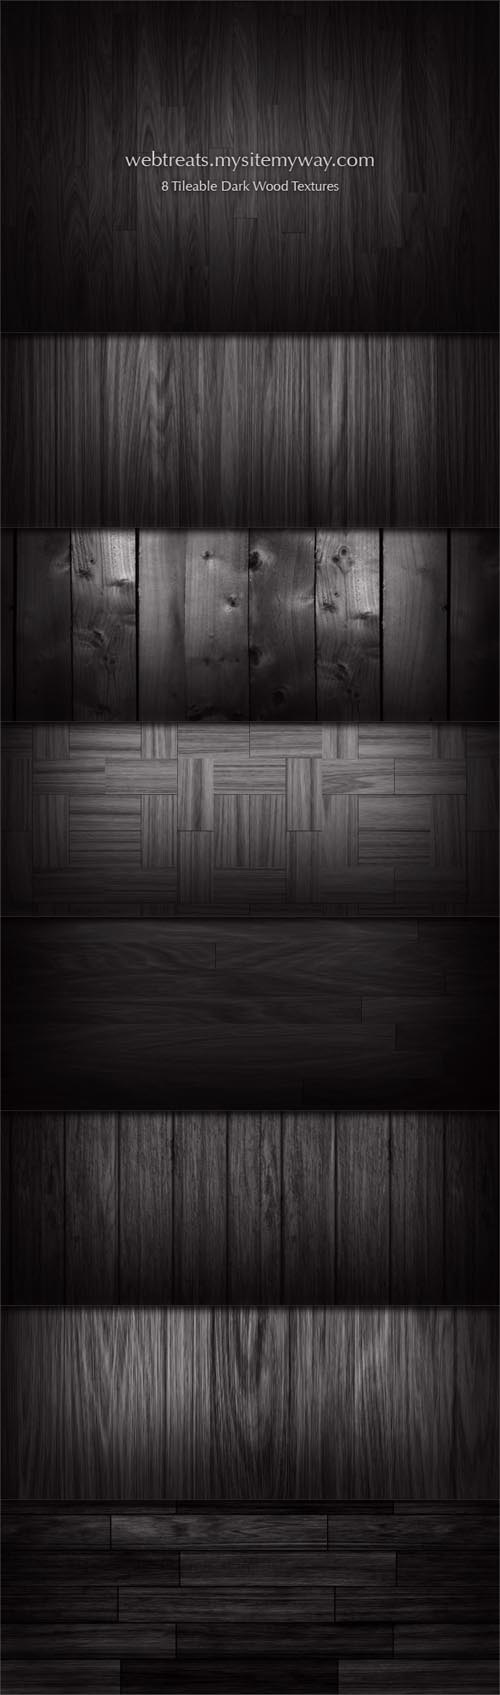 High Qualtity Wood Textures-32